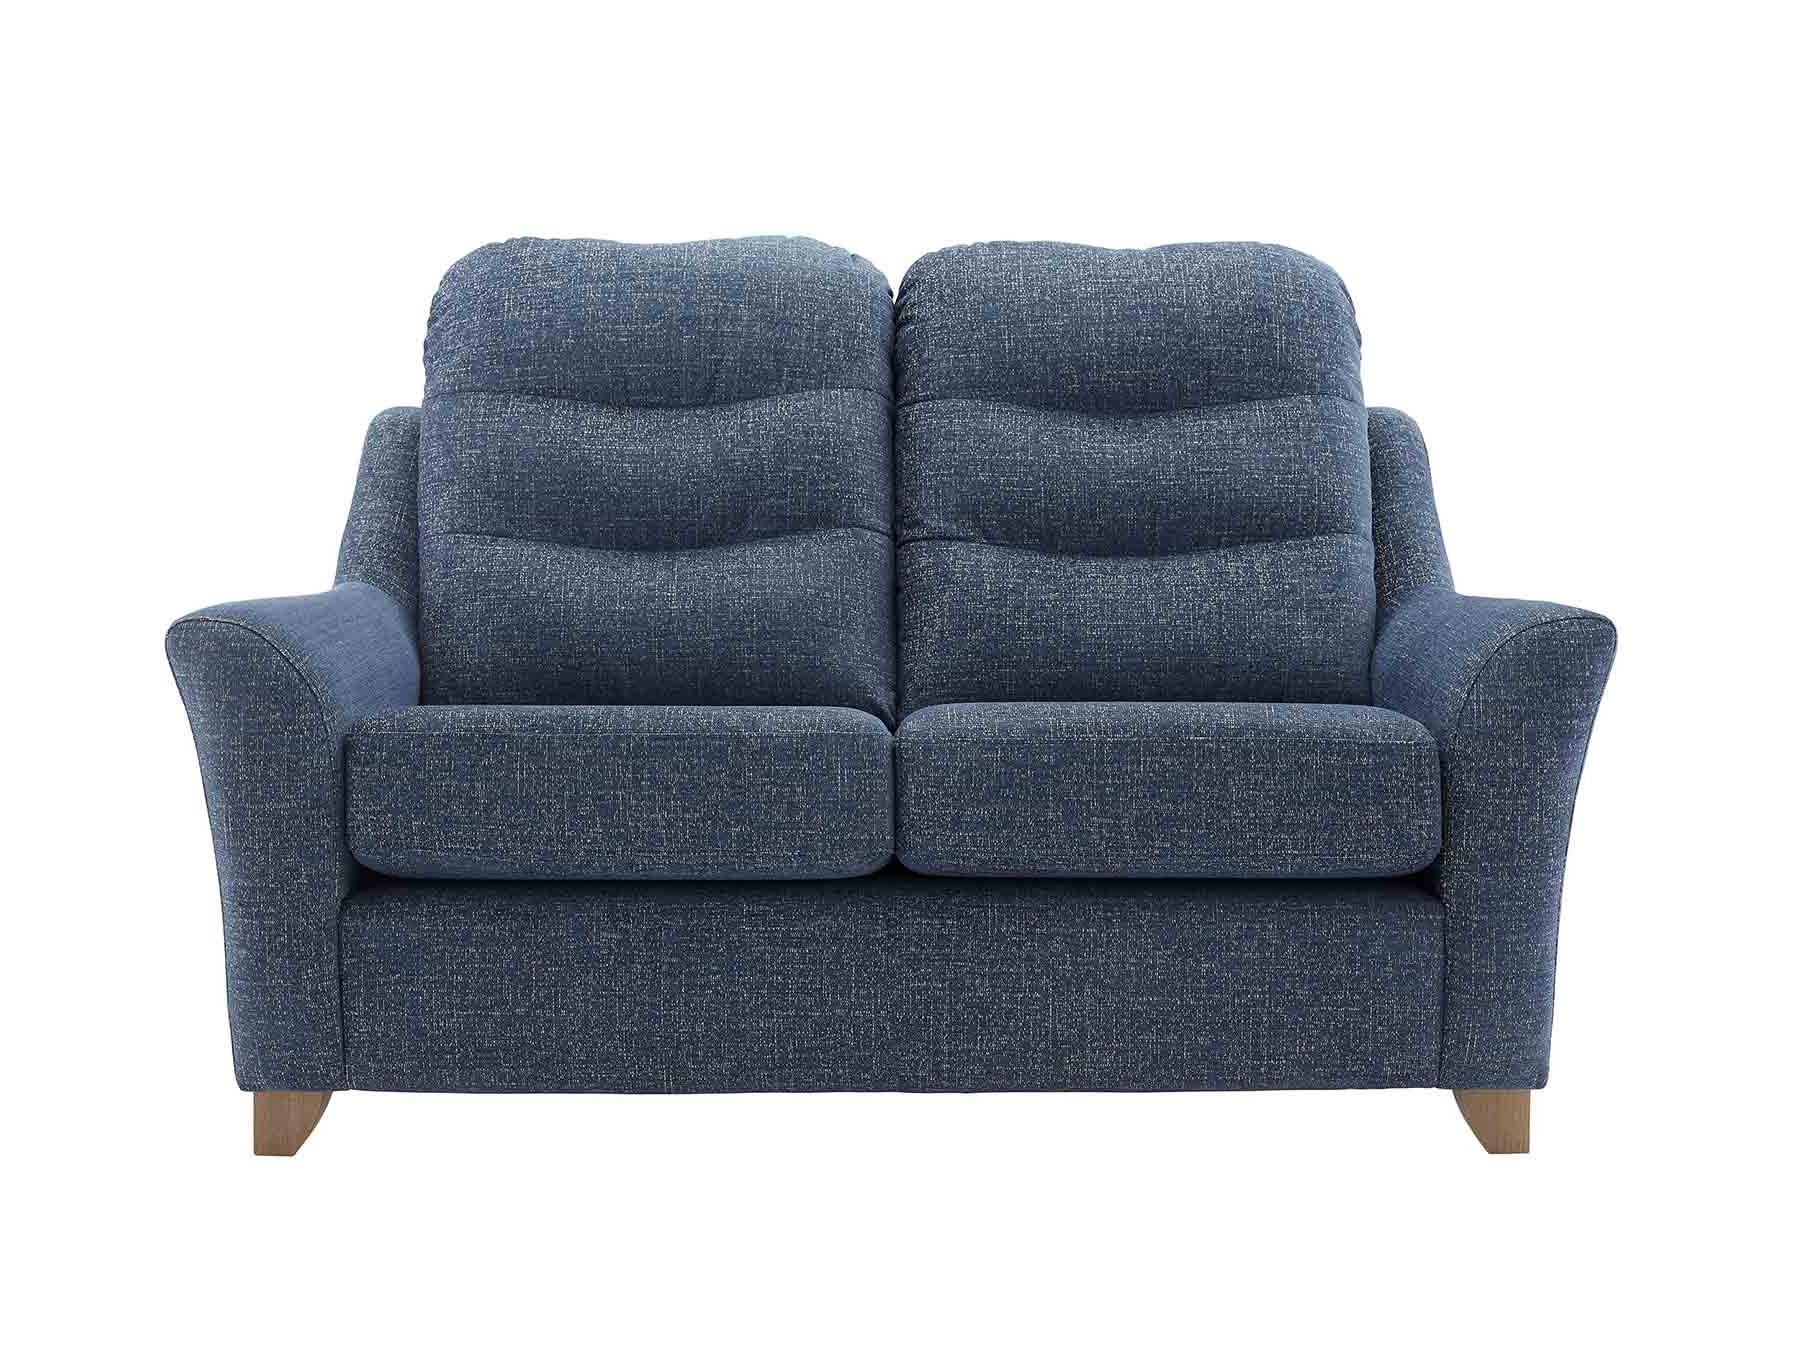 Tate Ii Sofa Chairs